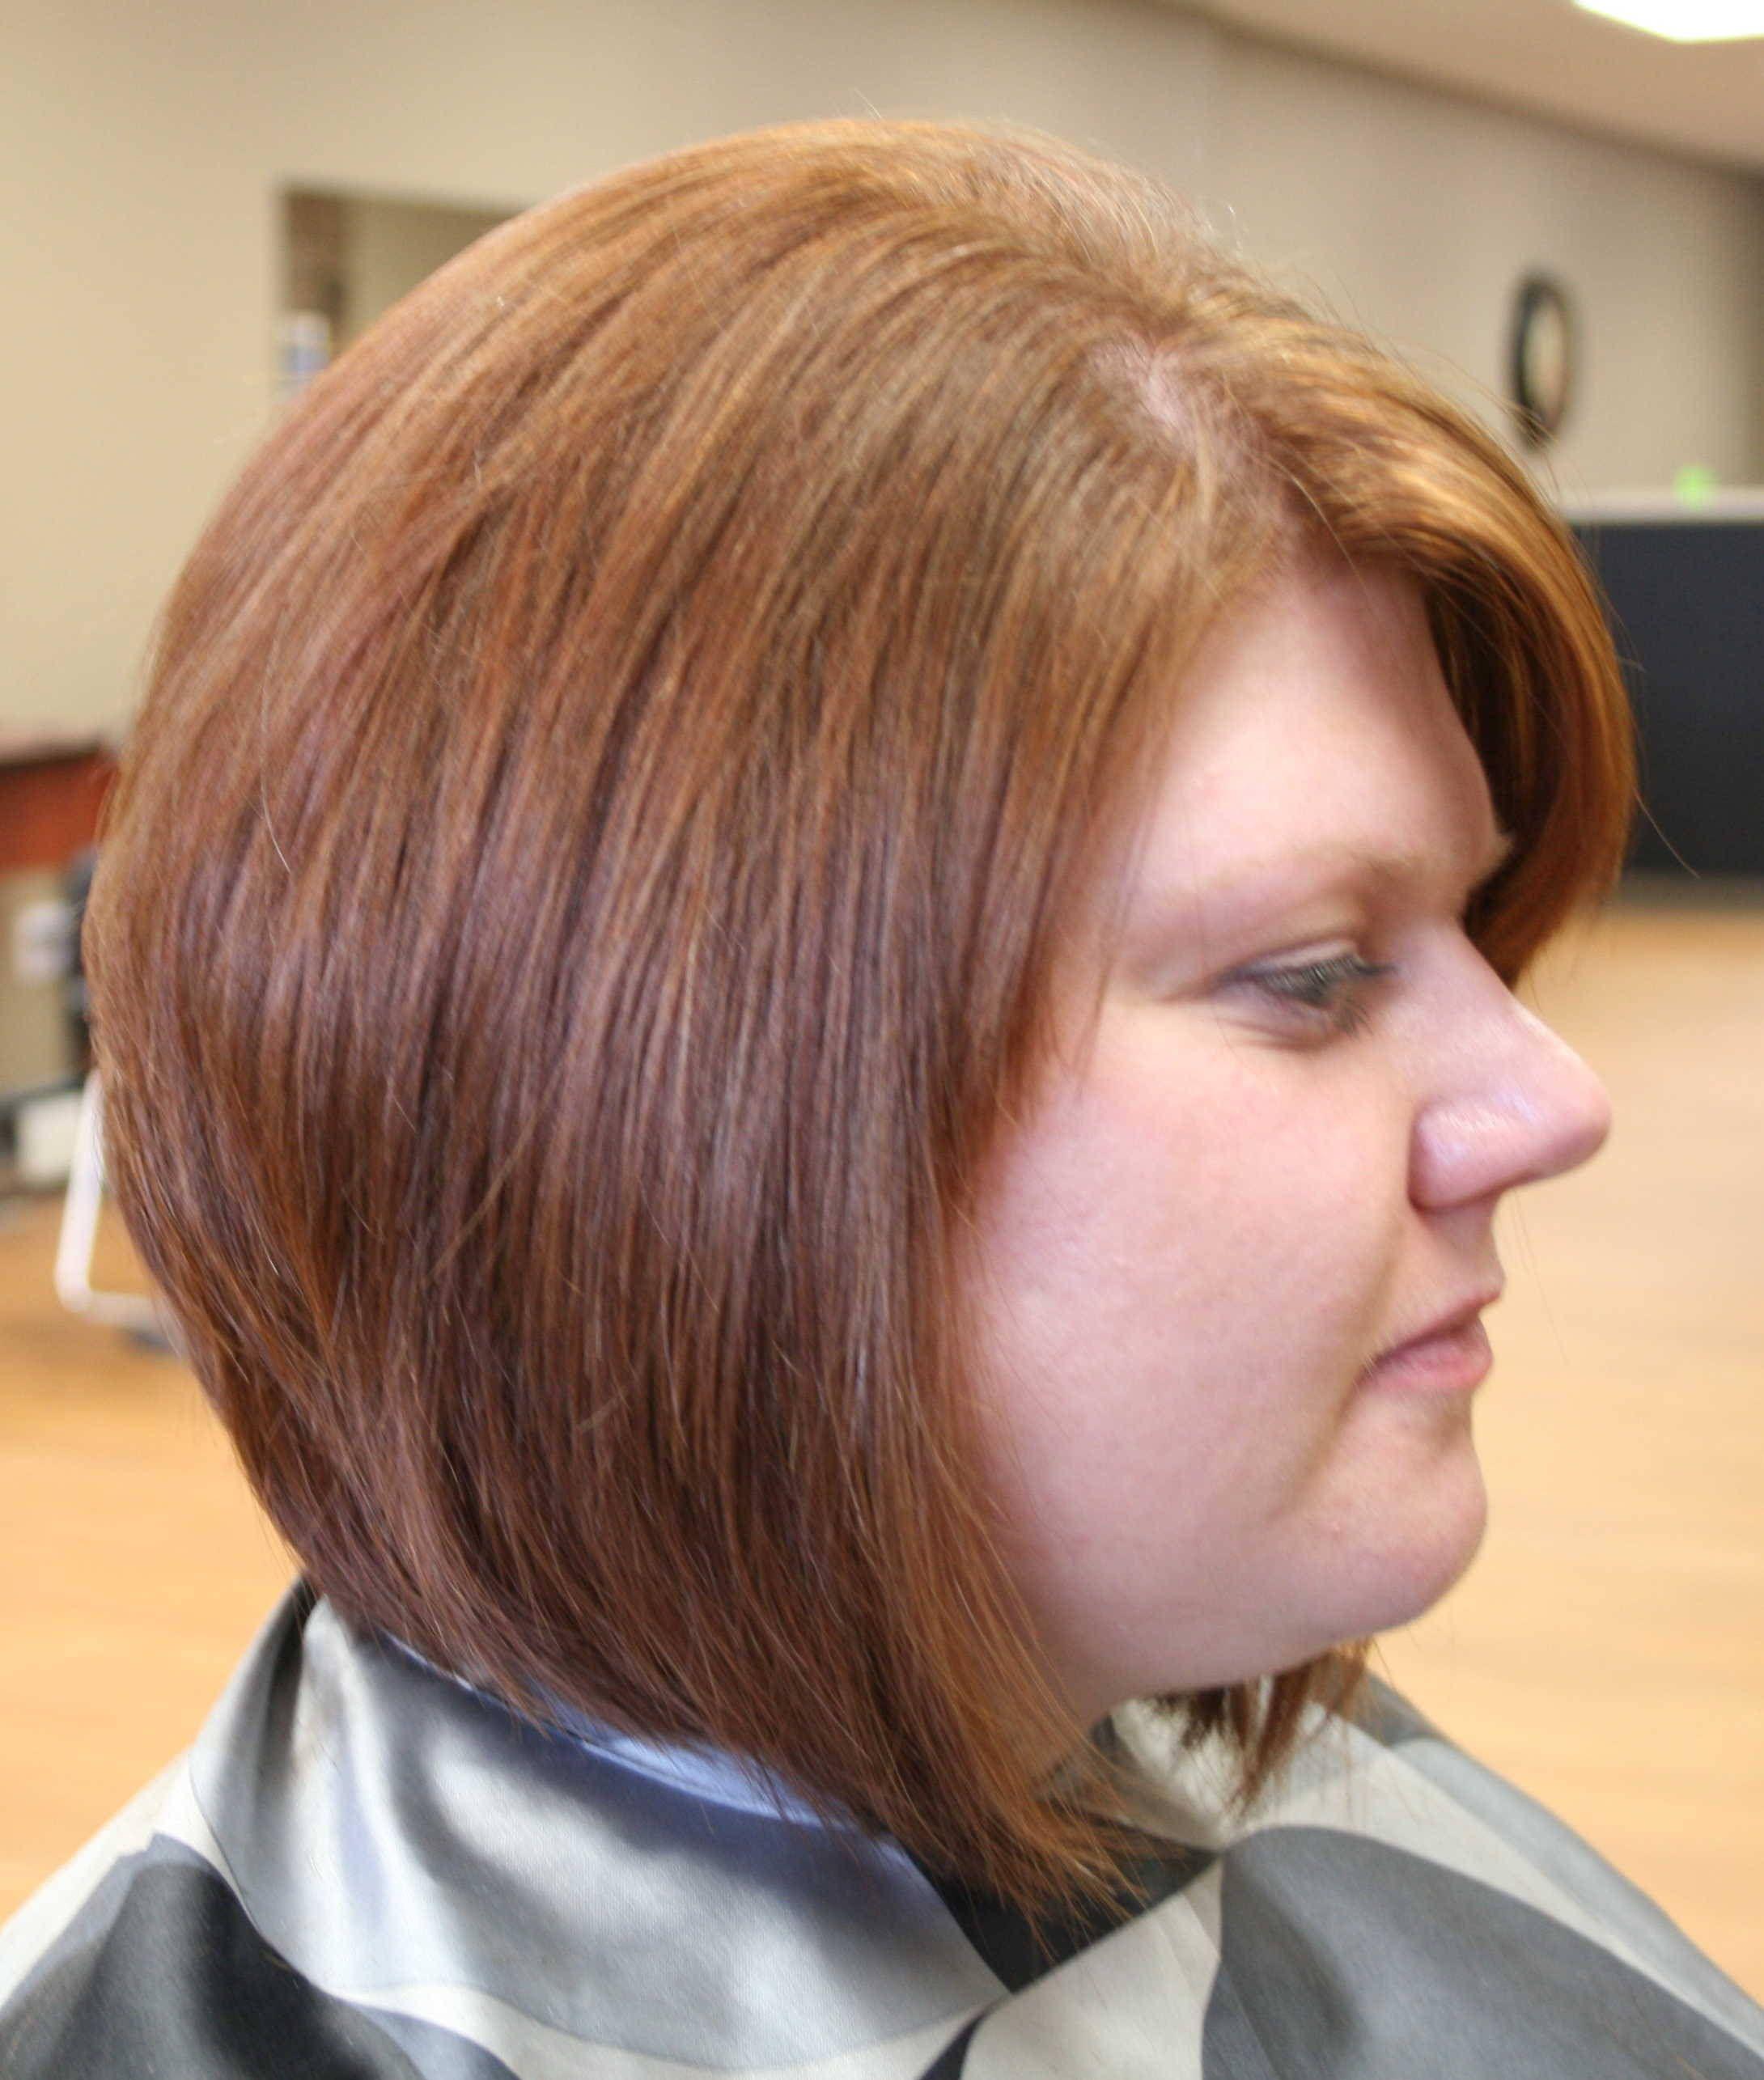 Pleasant 1000 Images About Short Bob Hair On Pinterest A Line Bobs Bob Hairstyles For Women Draintrainus